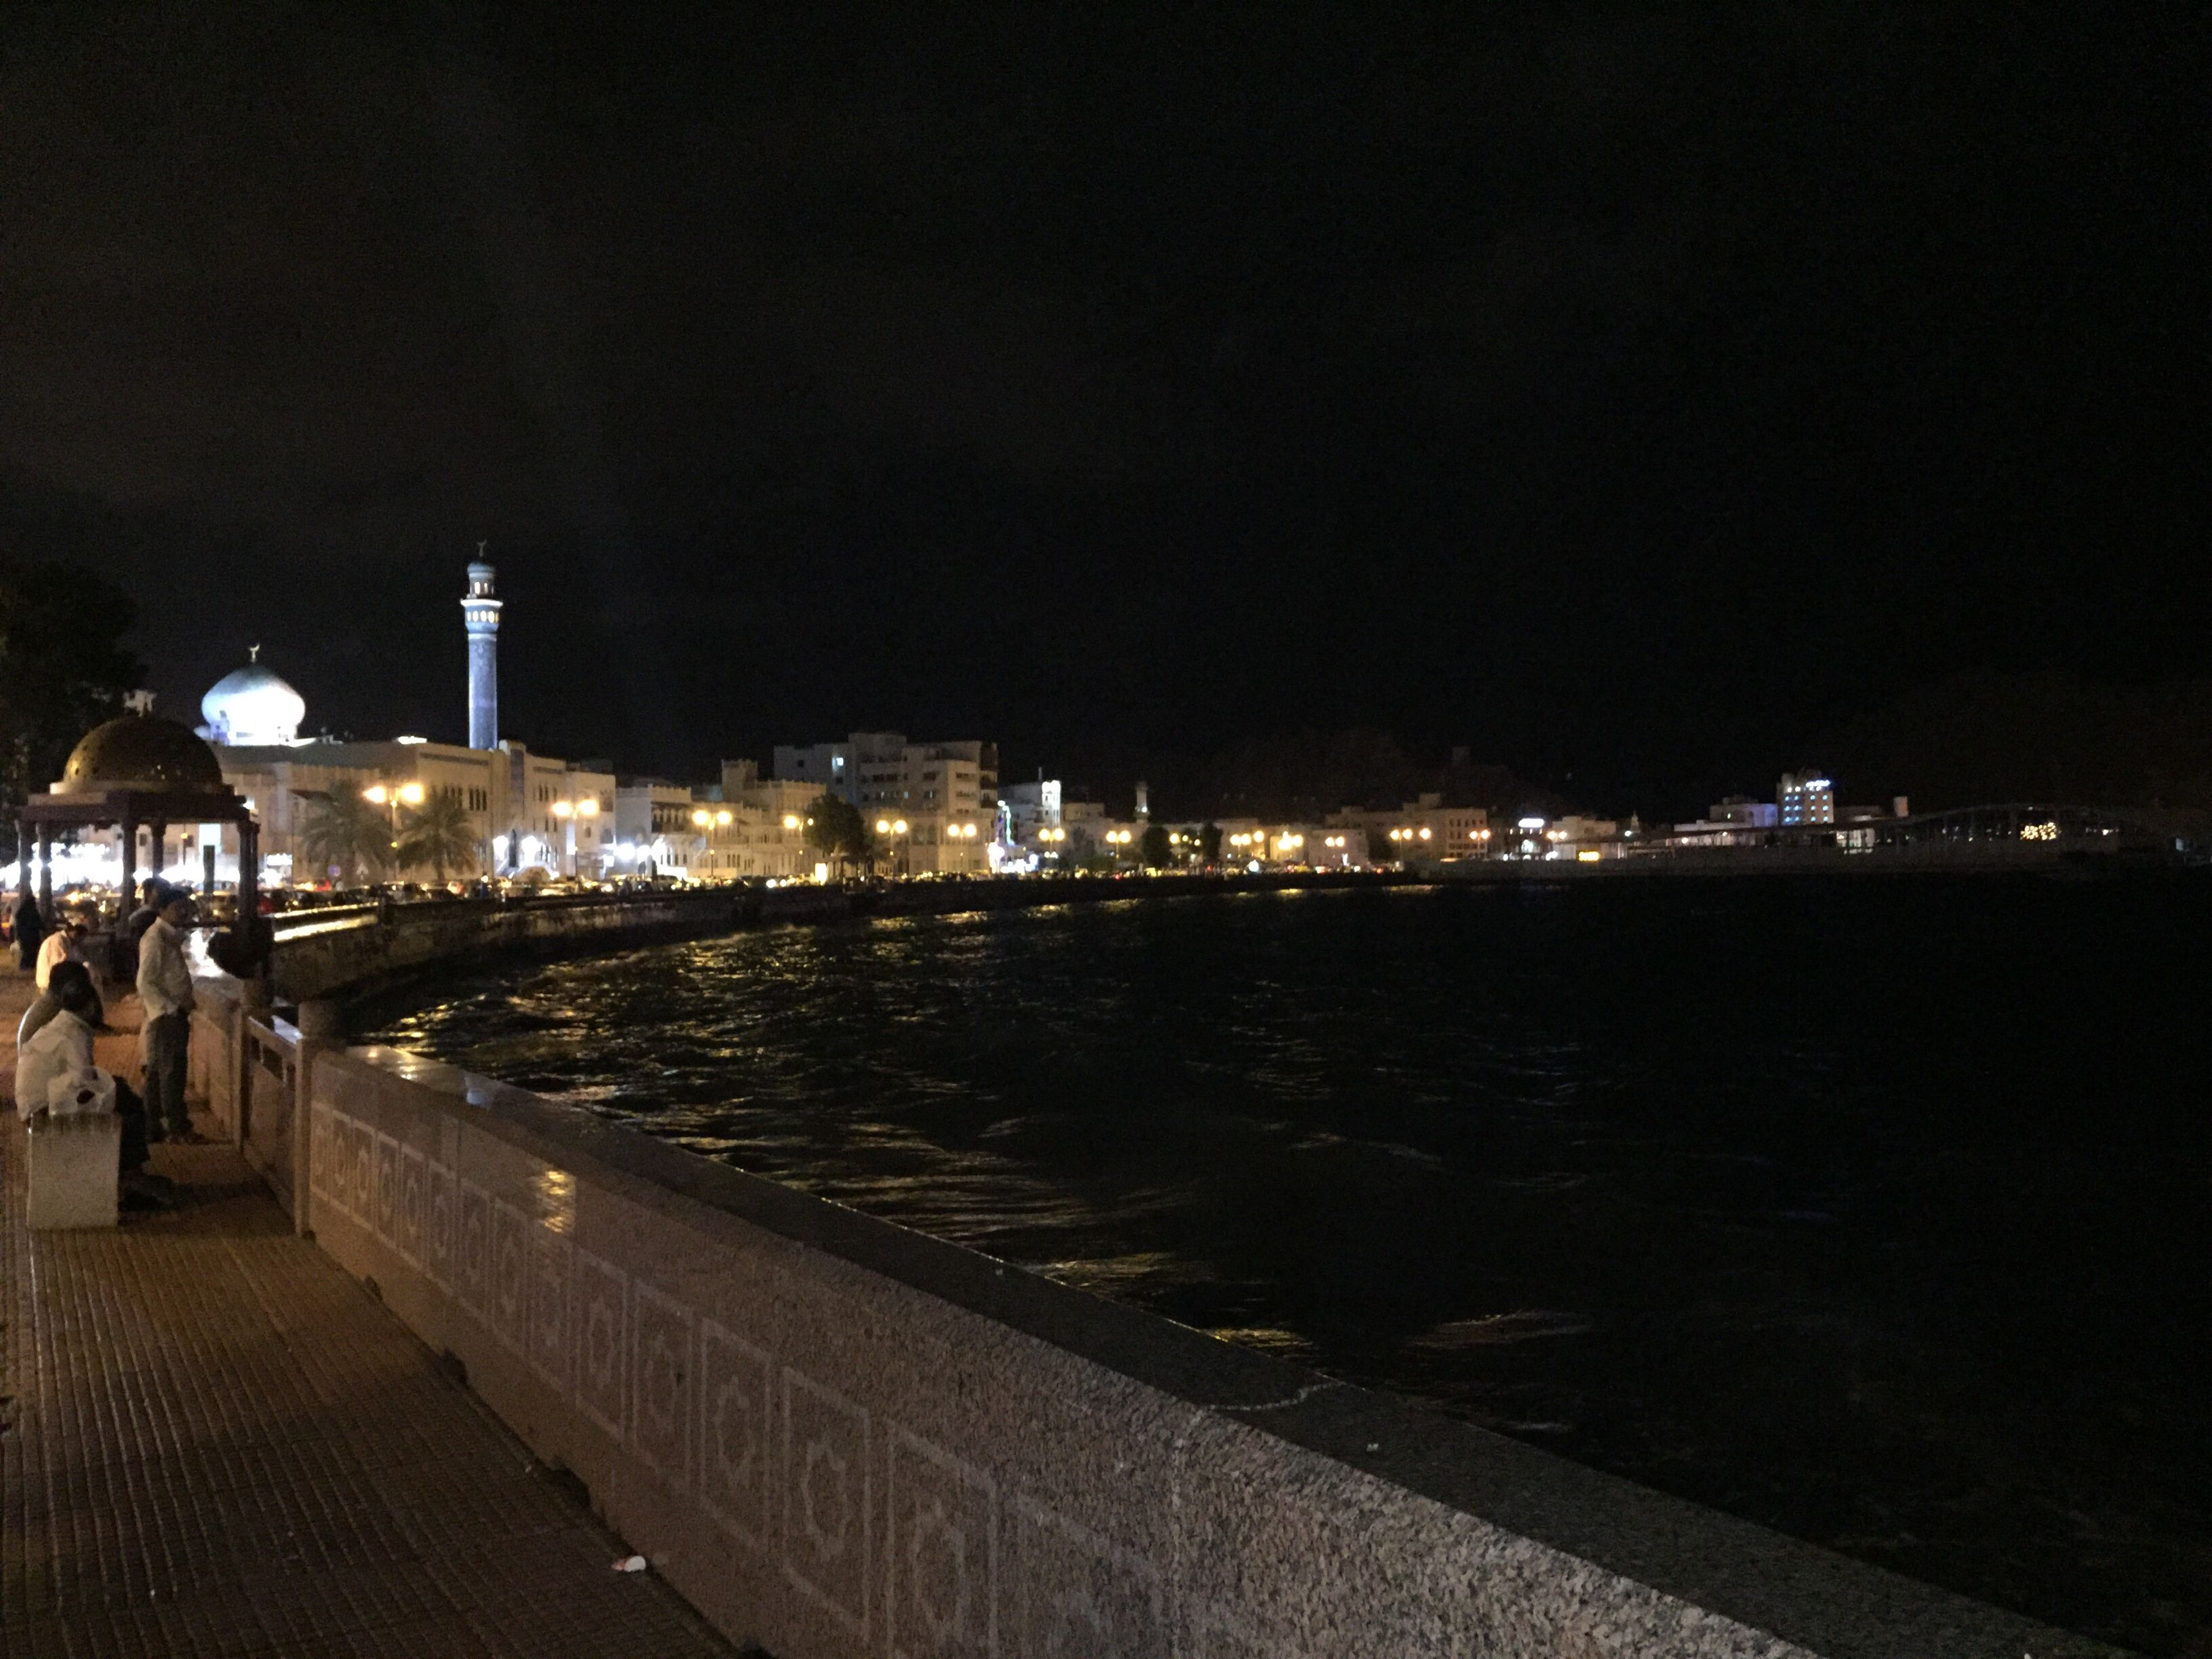 night, illuminated, city, architecture, sky, celebration, water, no people, outdoors, nature